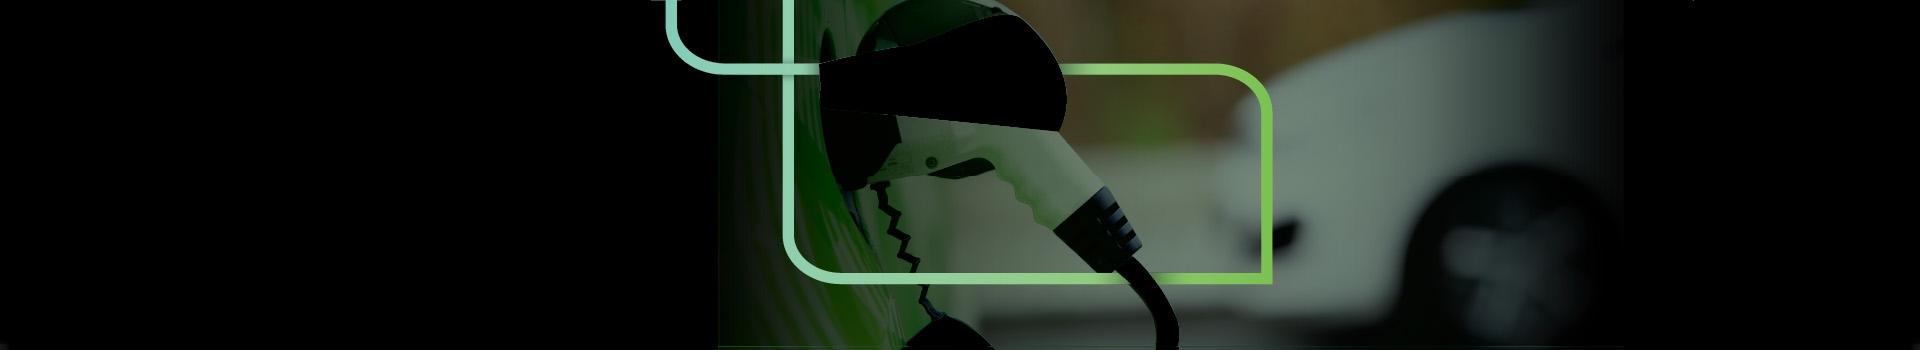 Volvo fabricar elétricos próxima década